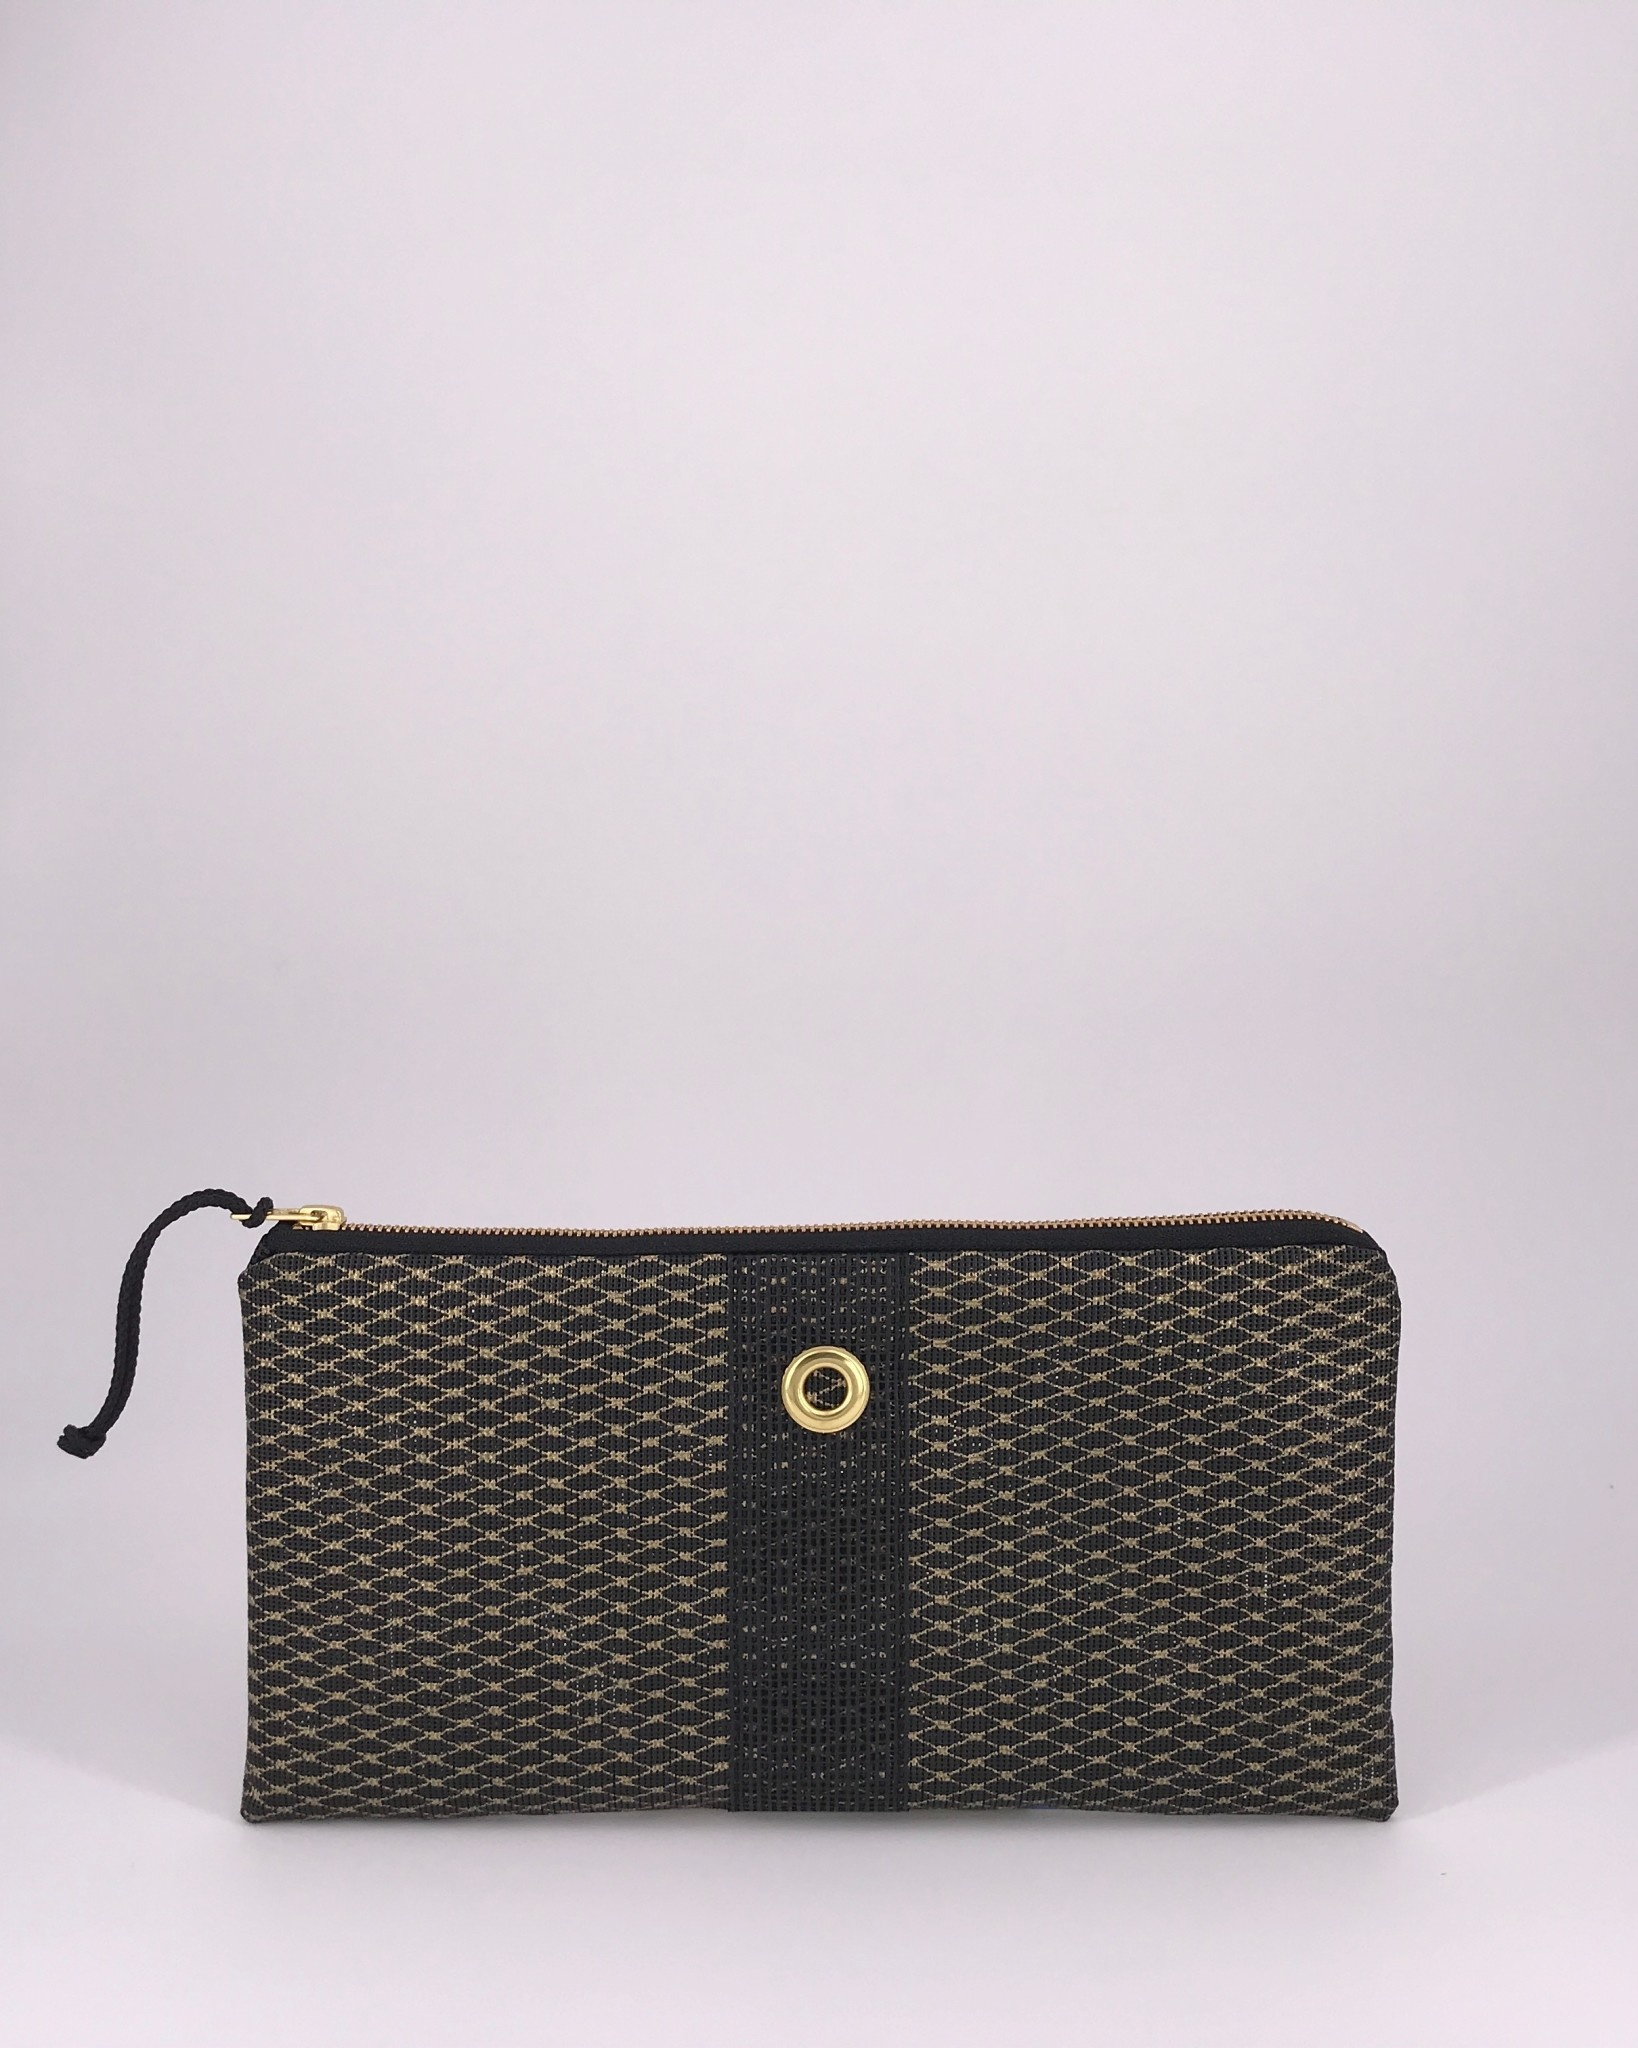 Alaina Marie ® Mini Gold Metallic on Black & Black Clutch